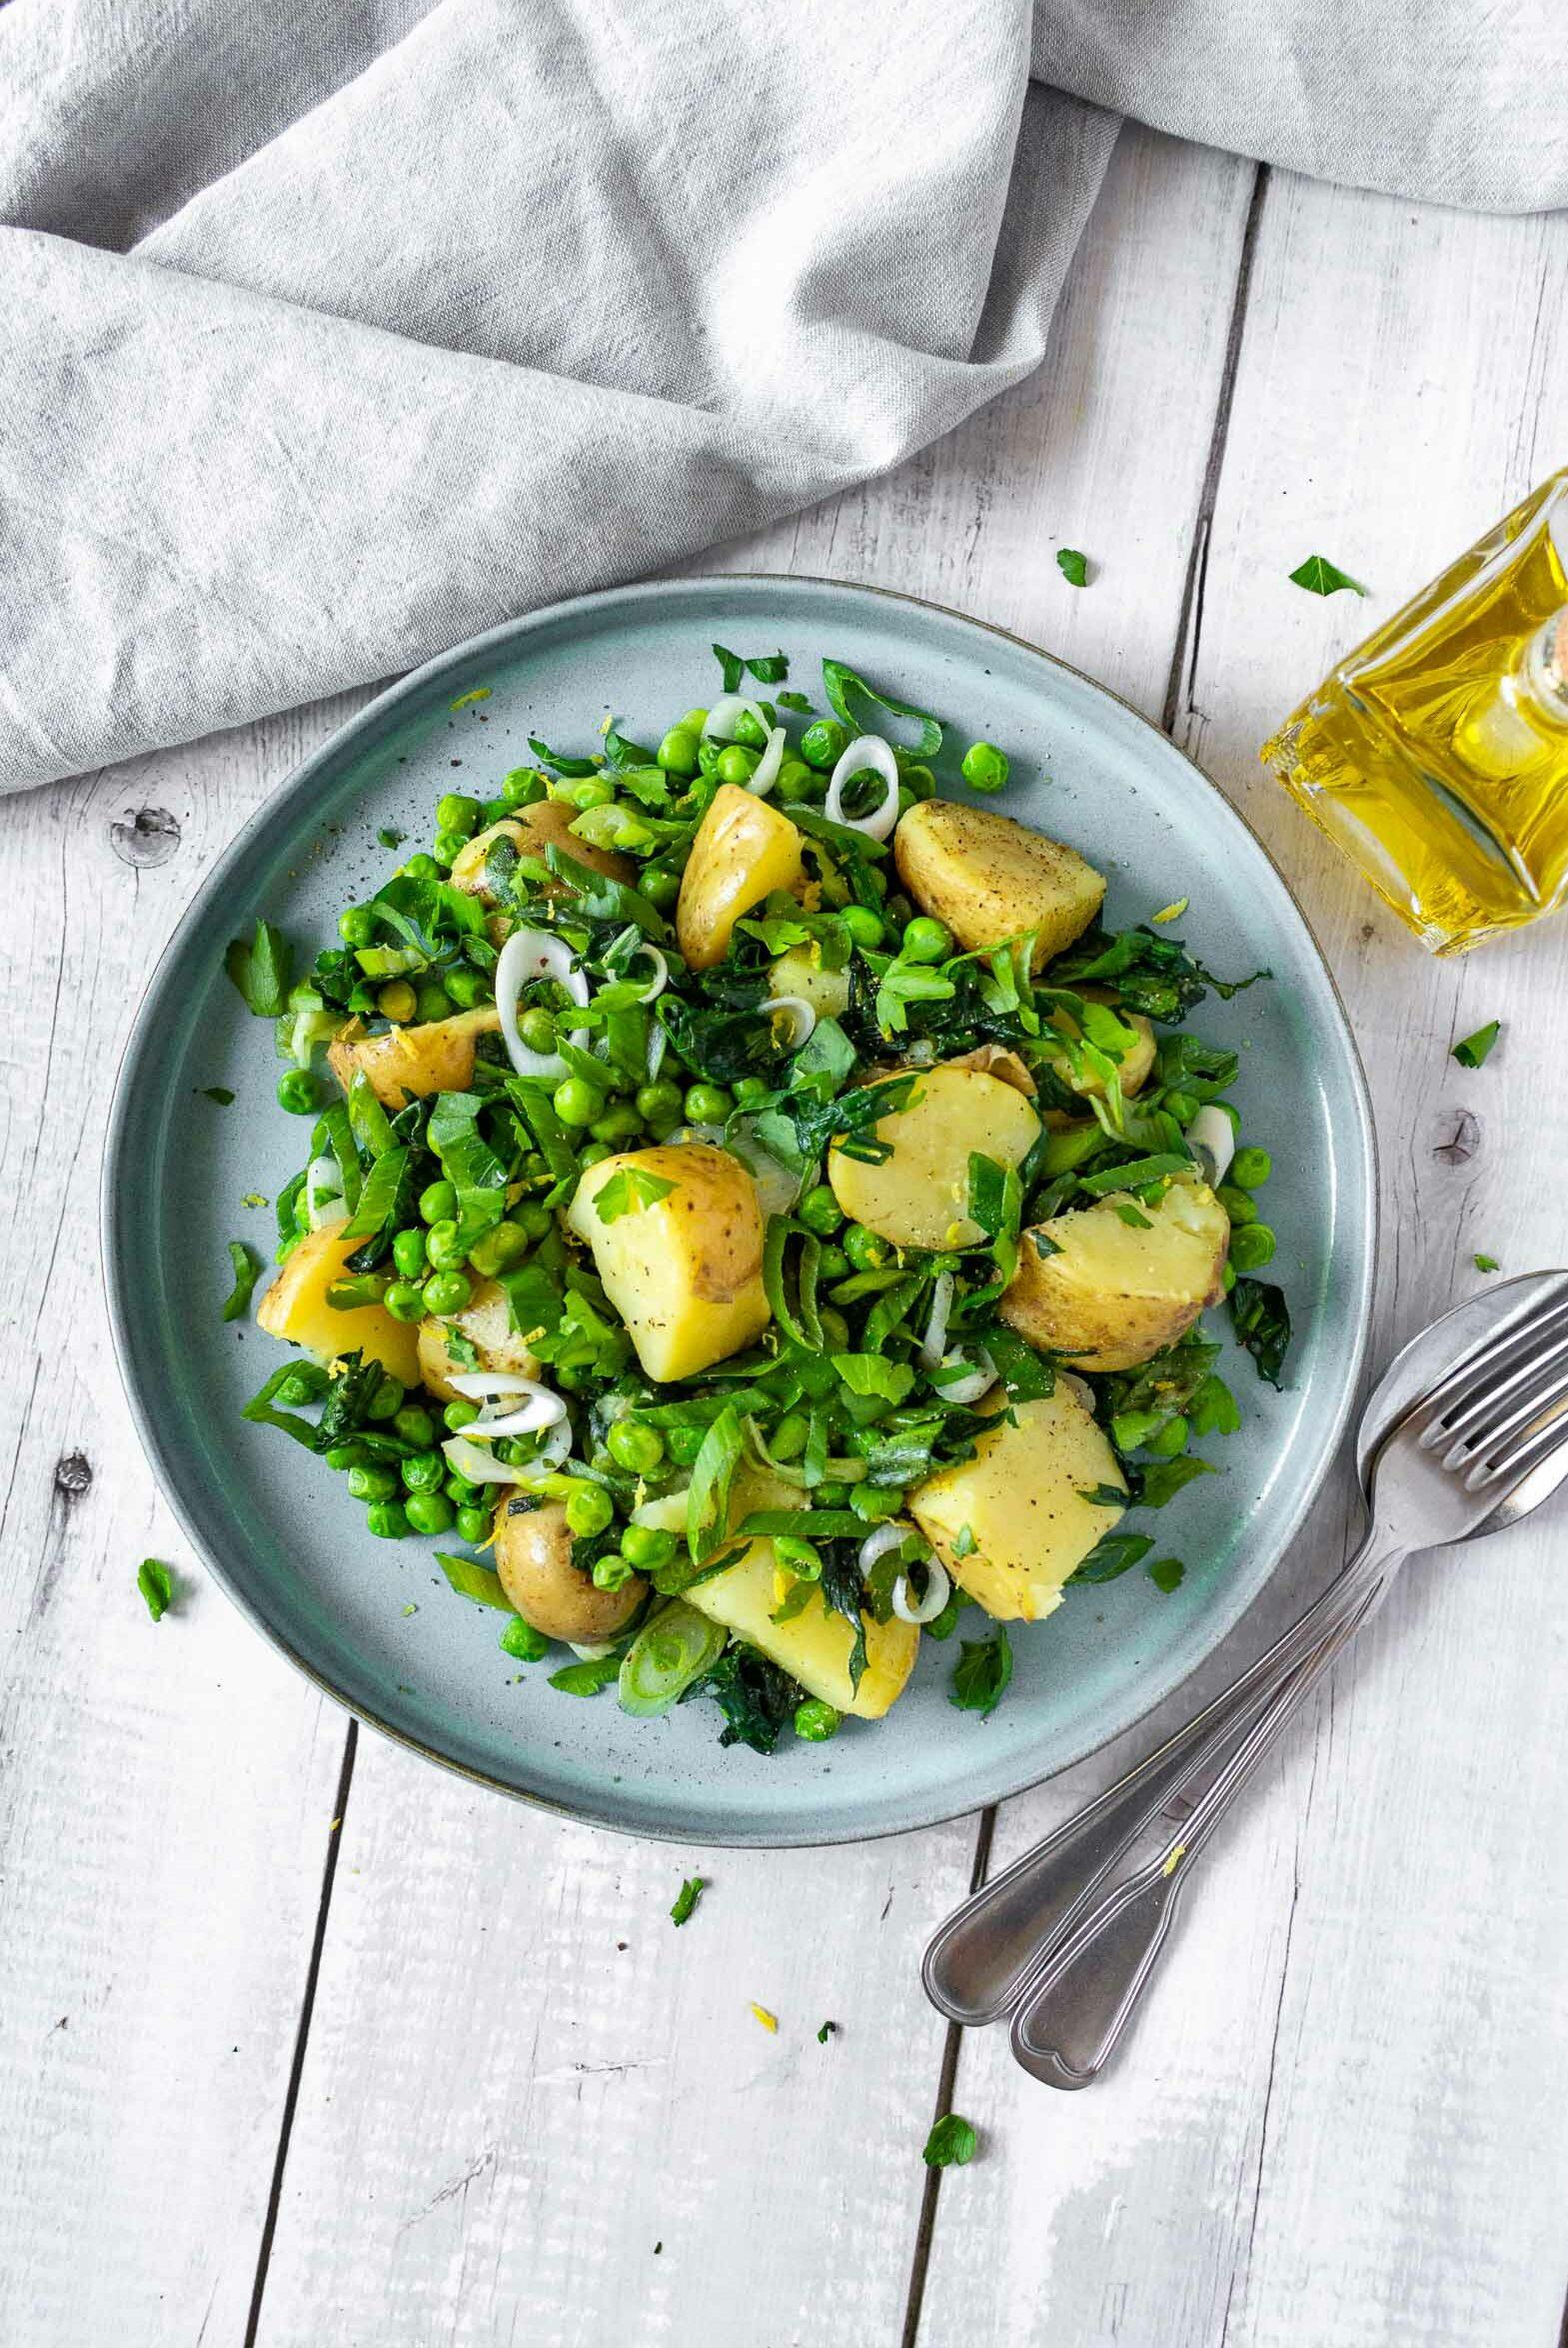 New Potatoes, Wild Garlic and Spring Greens Recipe